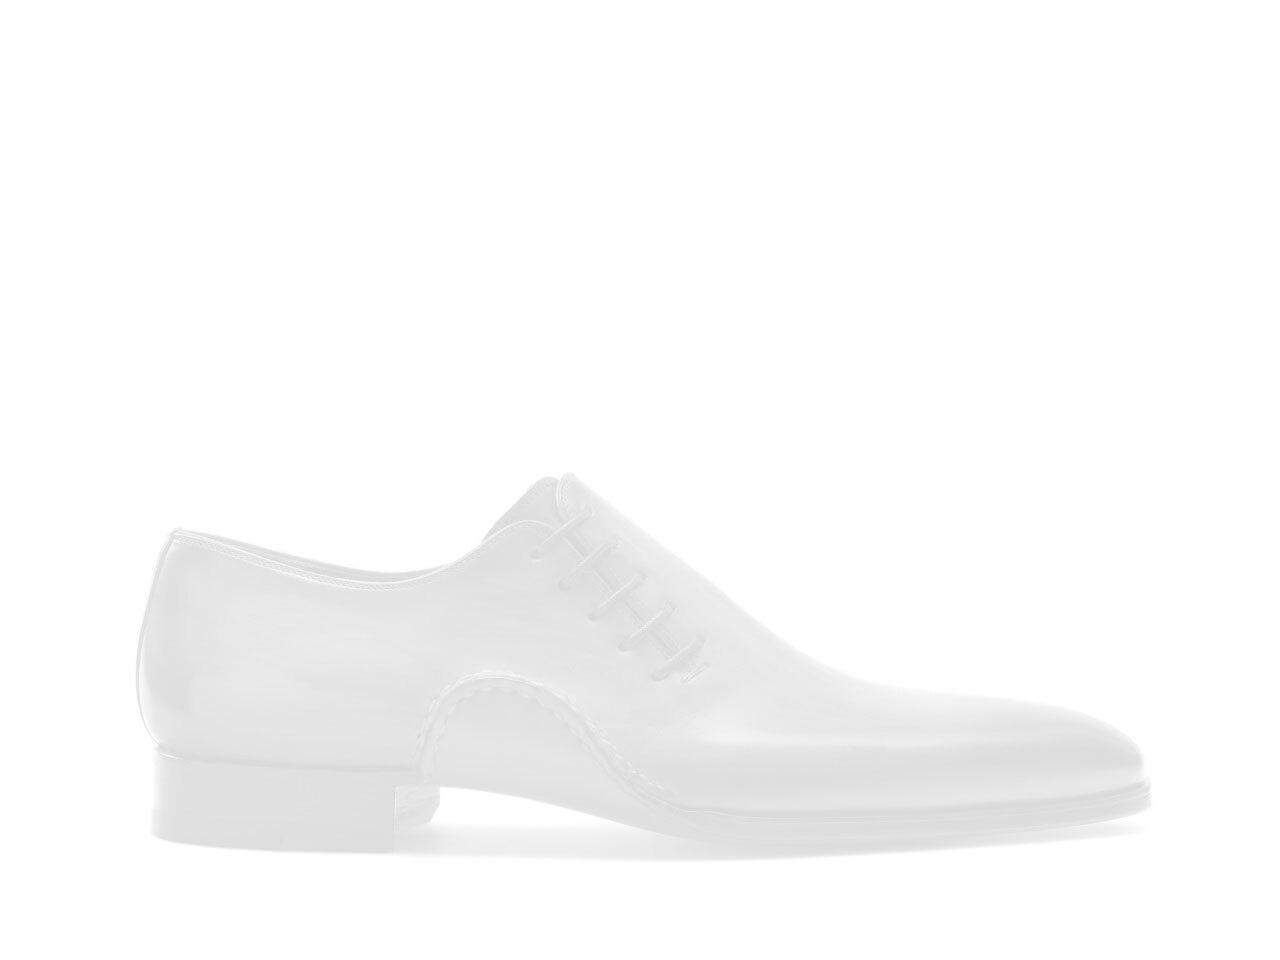 Sole of the Magnanni Bernina Castoro Men's Double Monk Strap Shoes